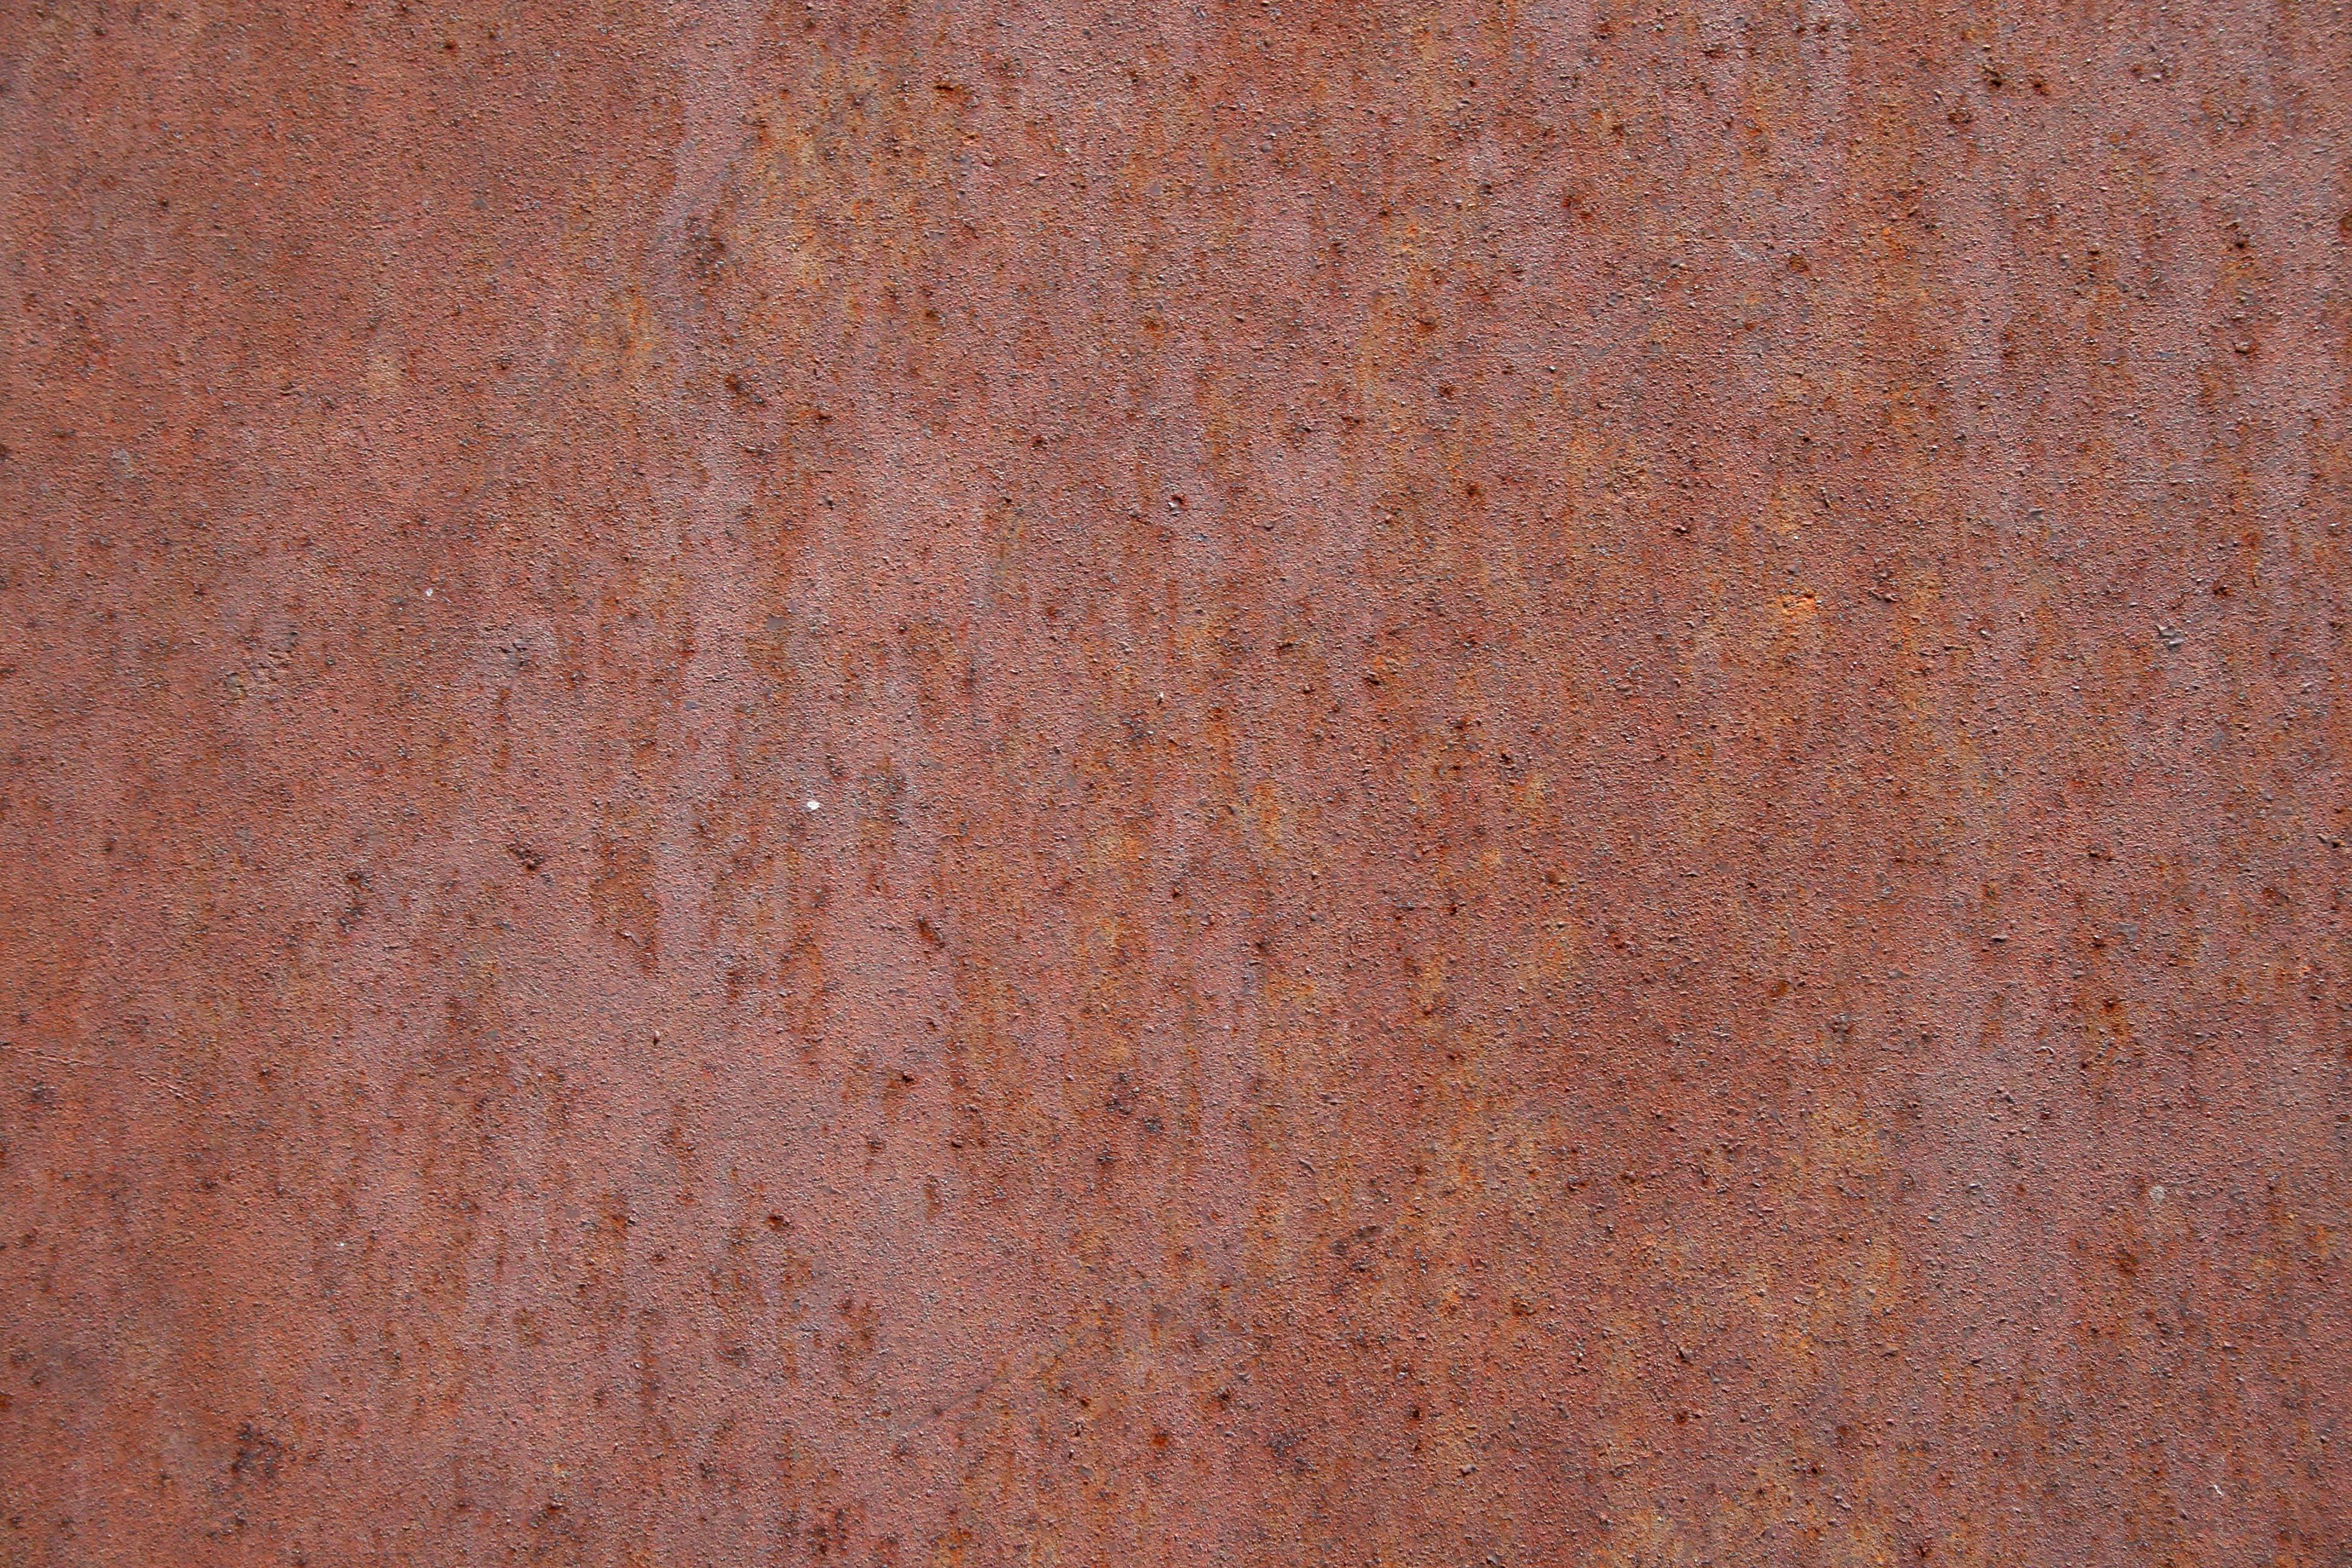 Rust texture photo